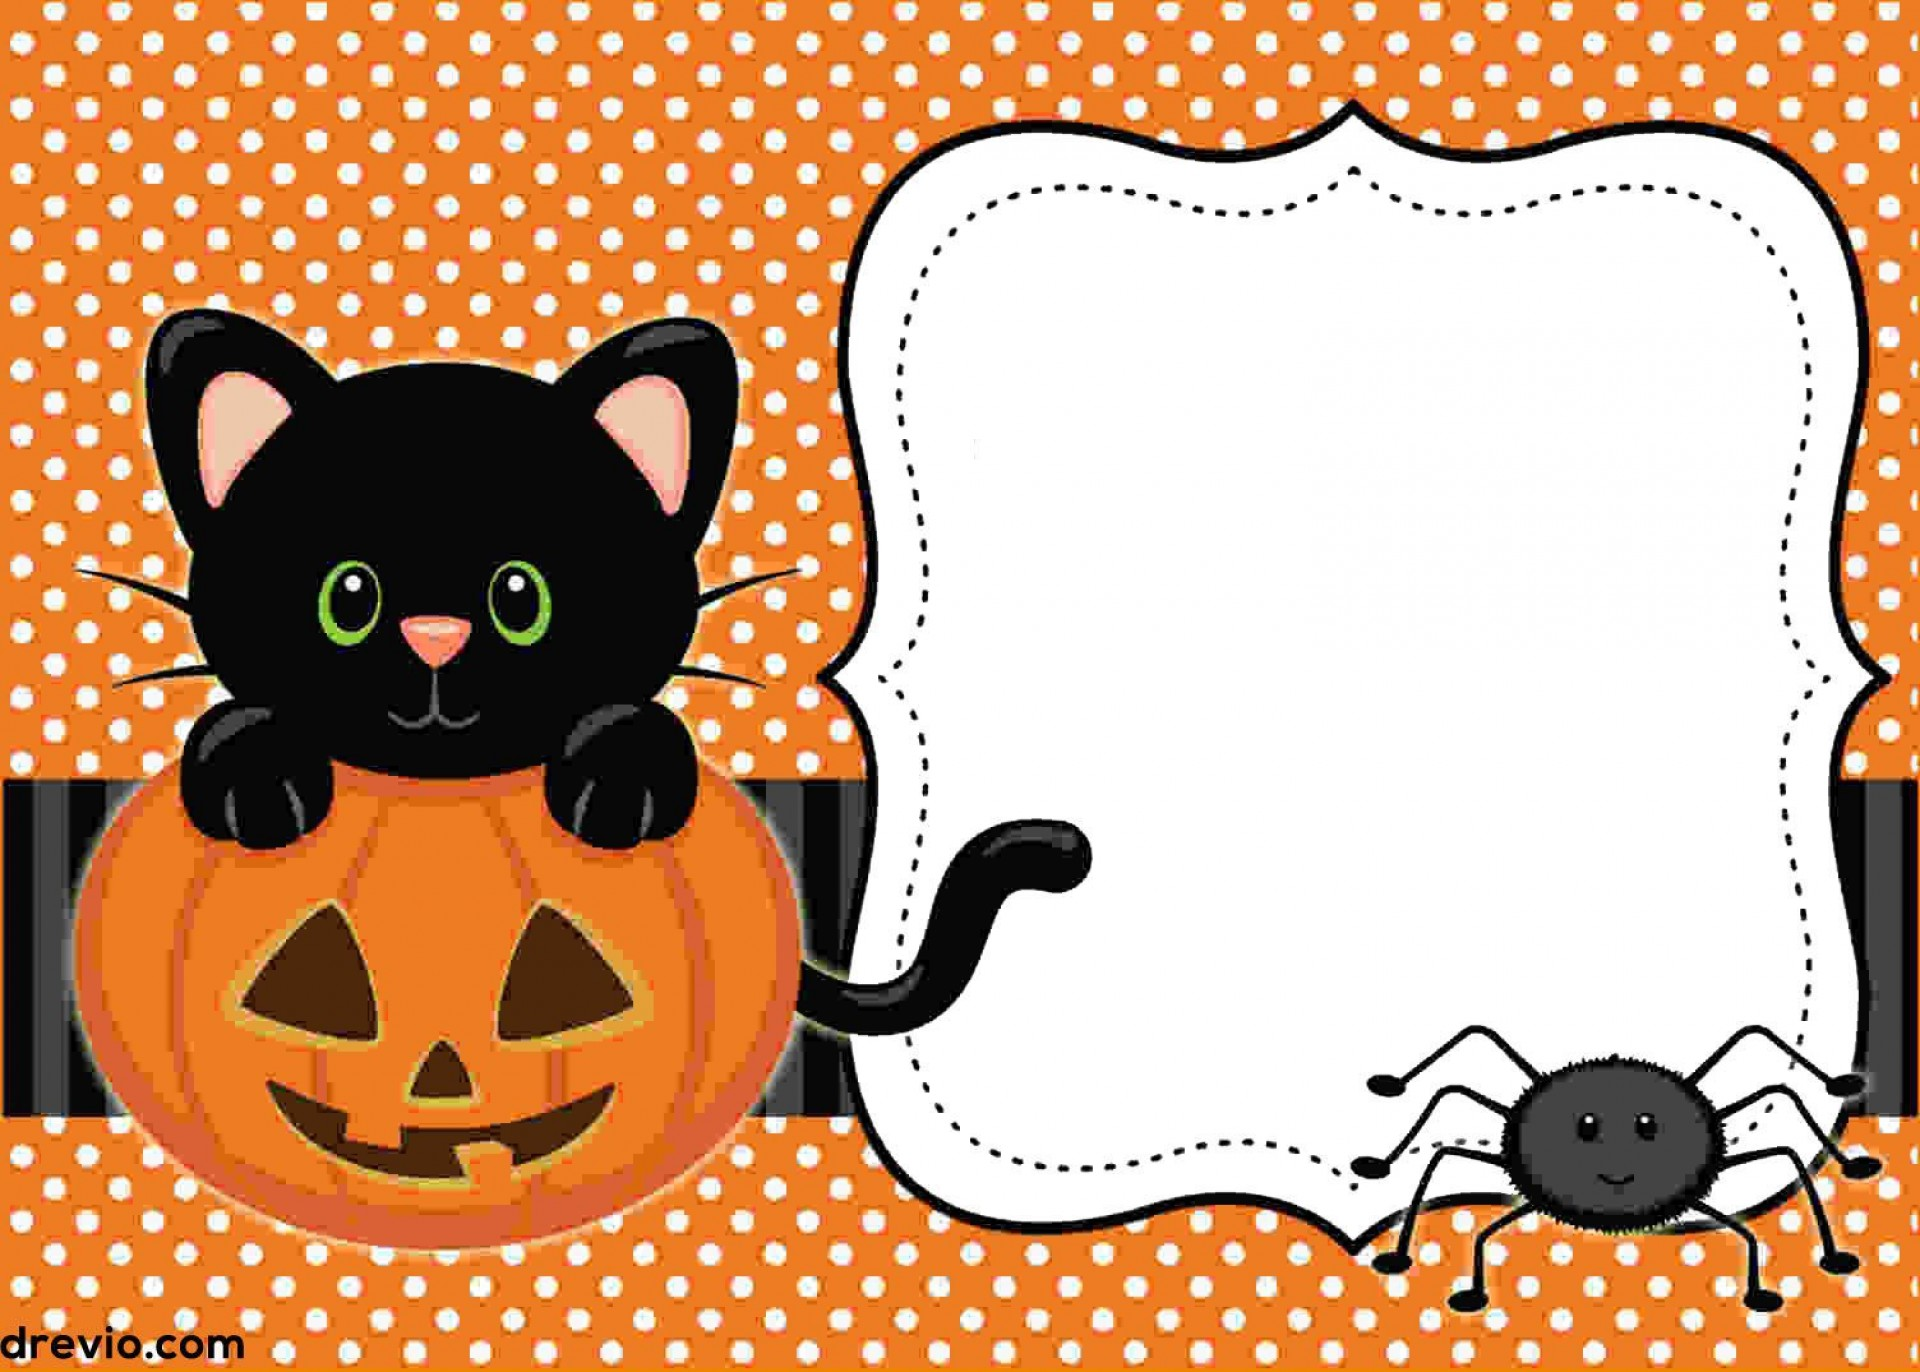 004 Singular Halloween Party Invitation Template Highest Quality  Microsoft Block October1920